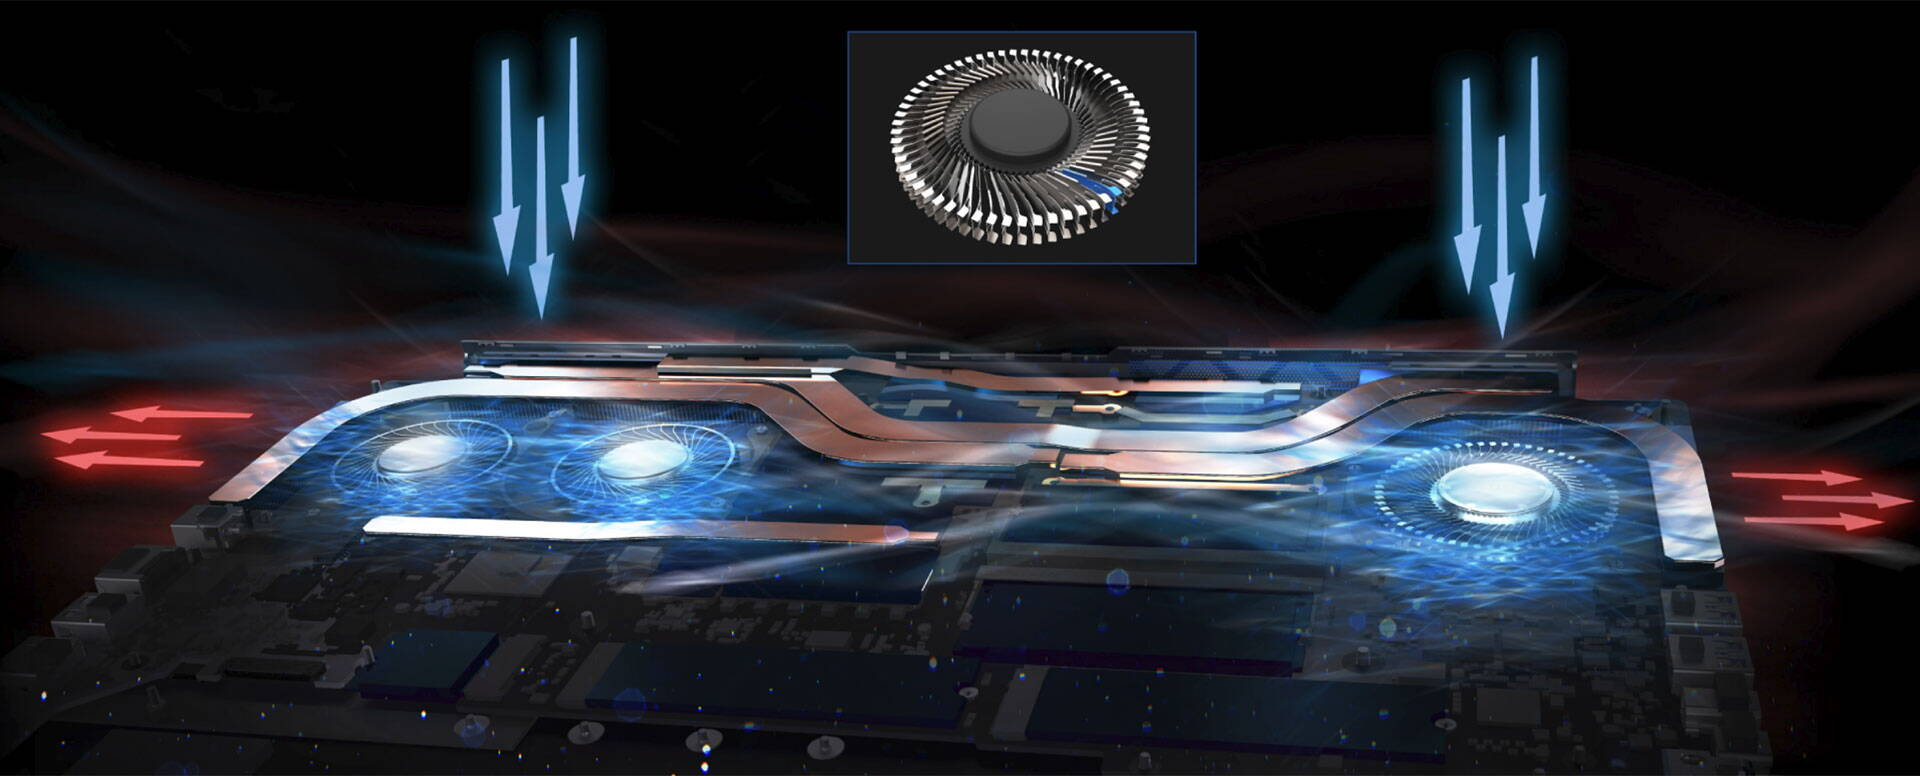 acer-predator-triton-500-cooling